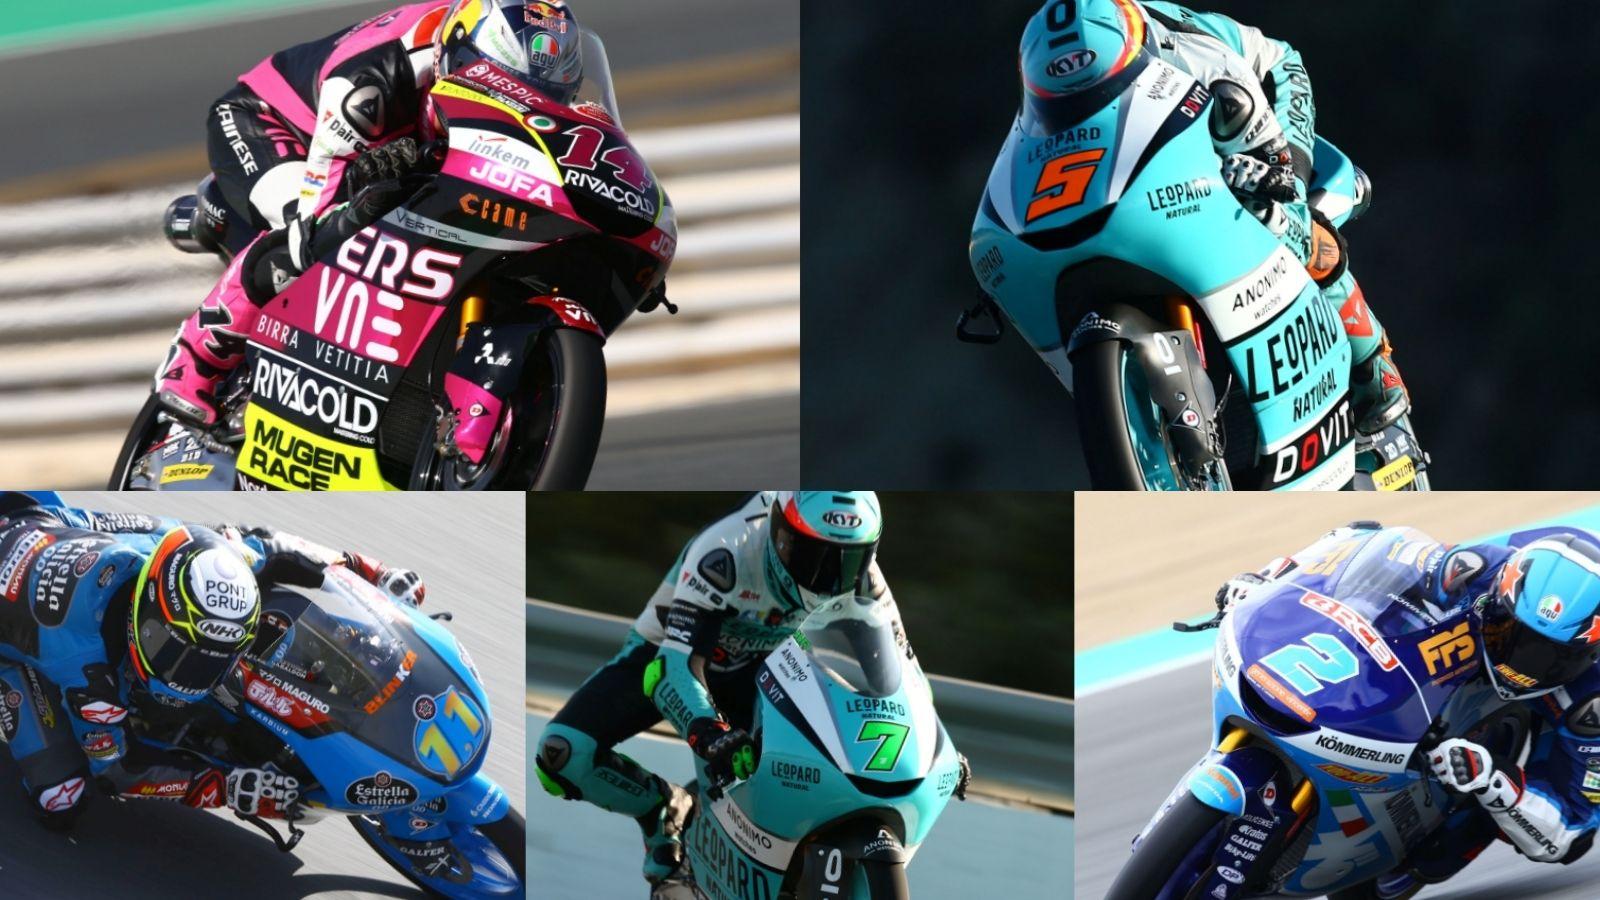 Moto3 2020 Pilotos Motos Equipos Calendario 7 Espanoles Y Cinco Favoritos